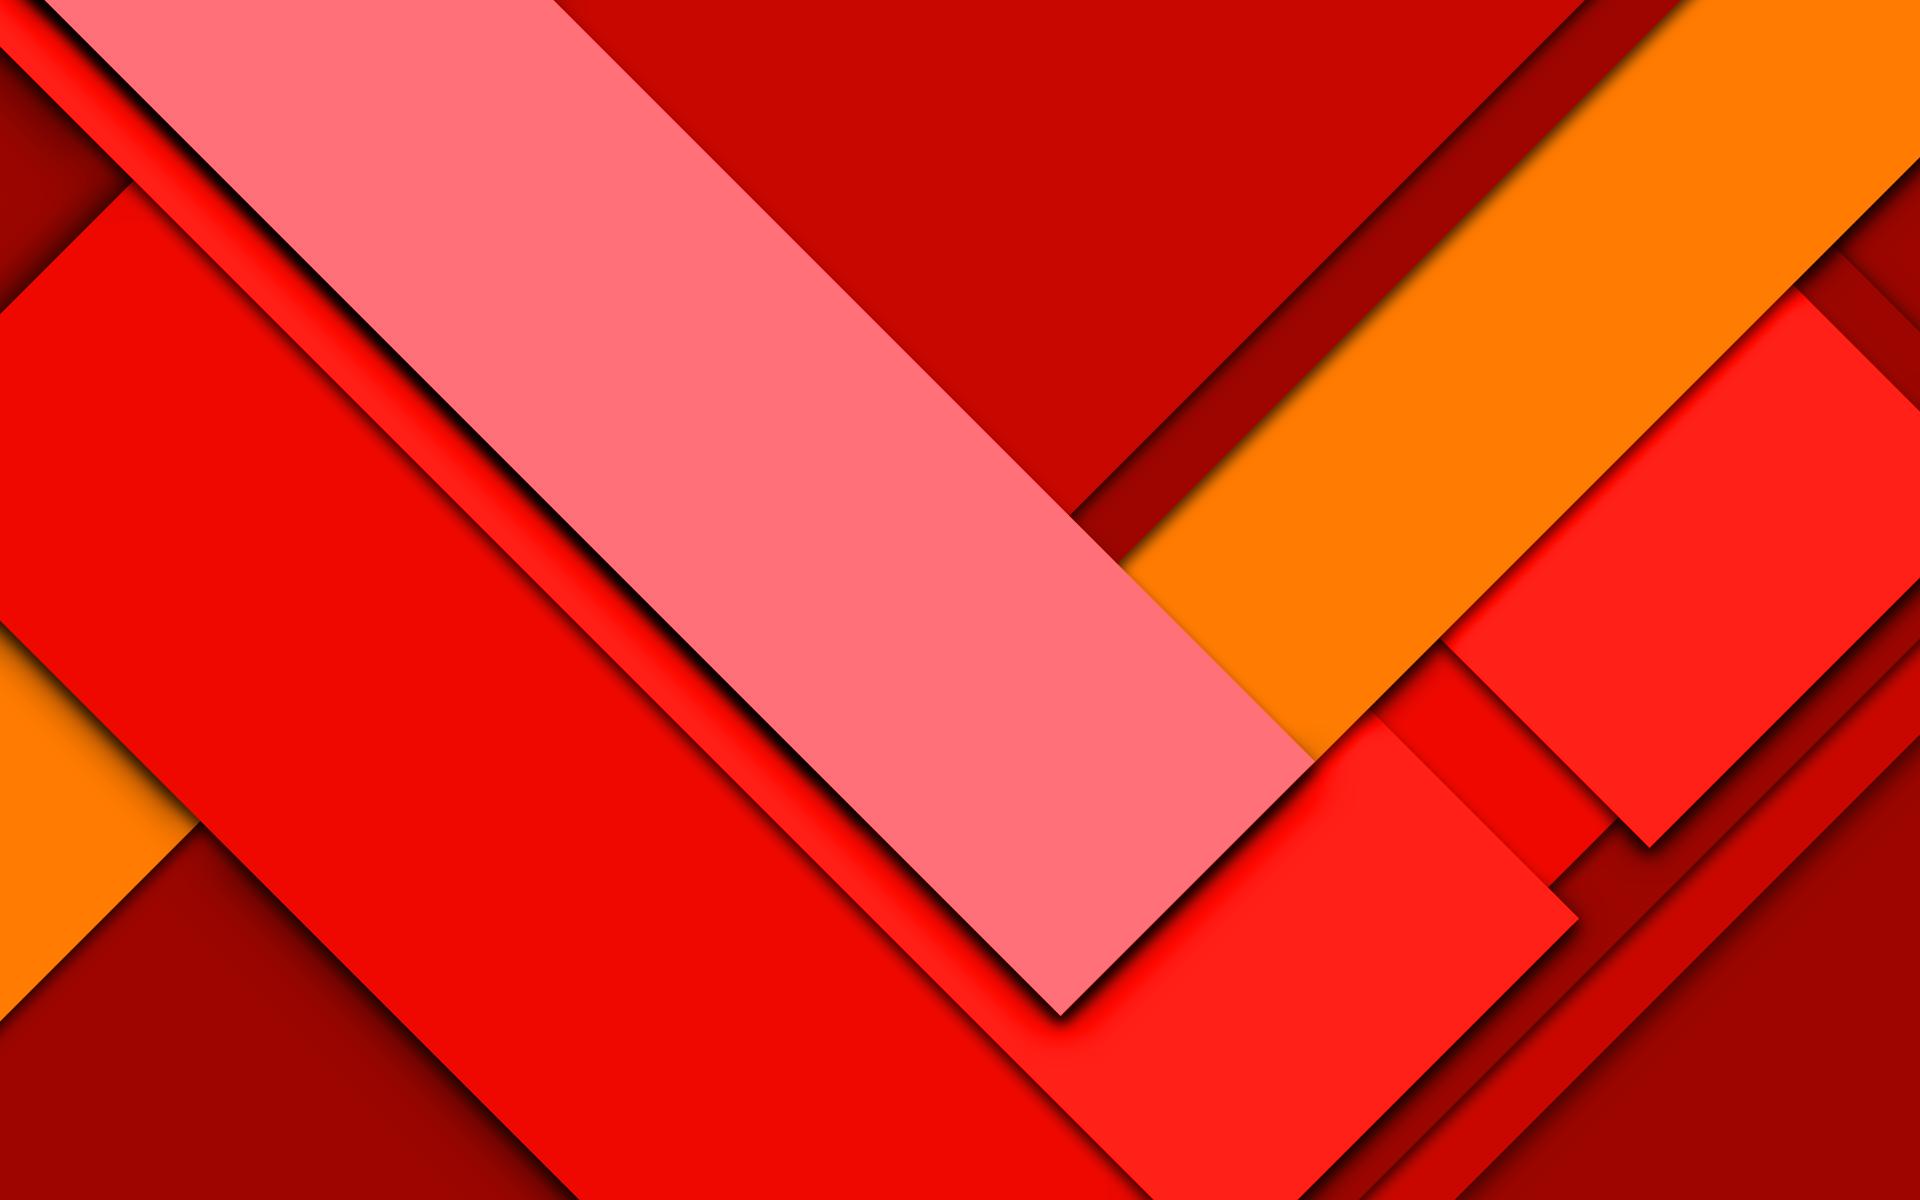 40 Best Material Design Wallpapers 4K (2016) HD Windows 7 ...